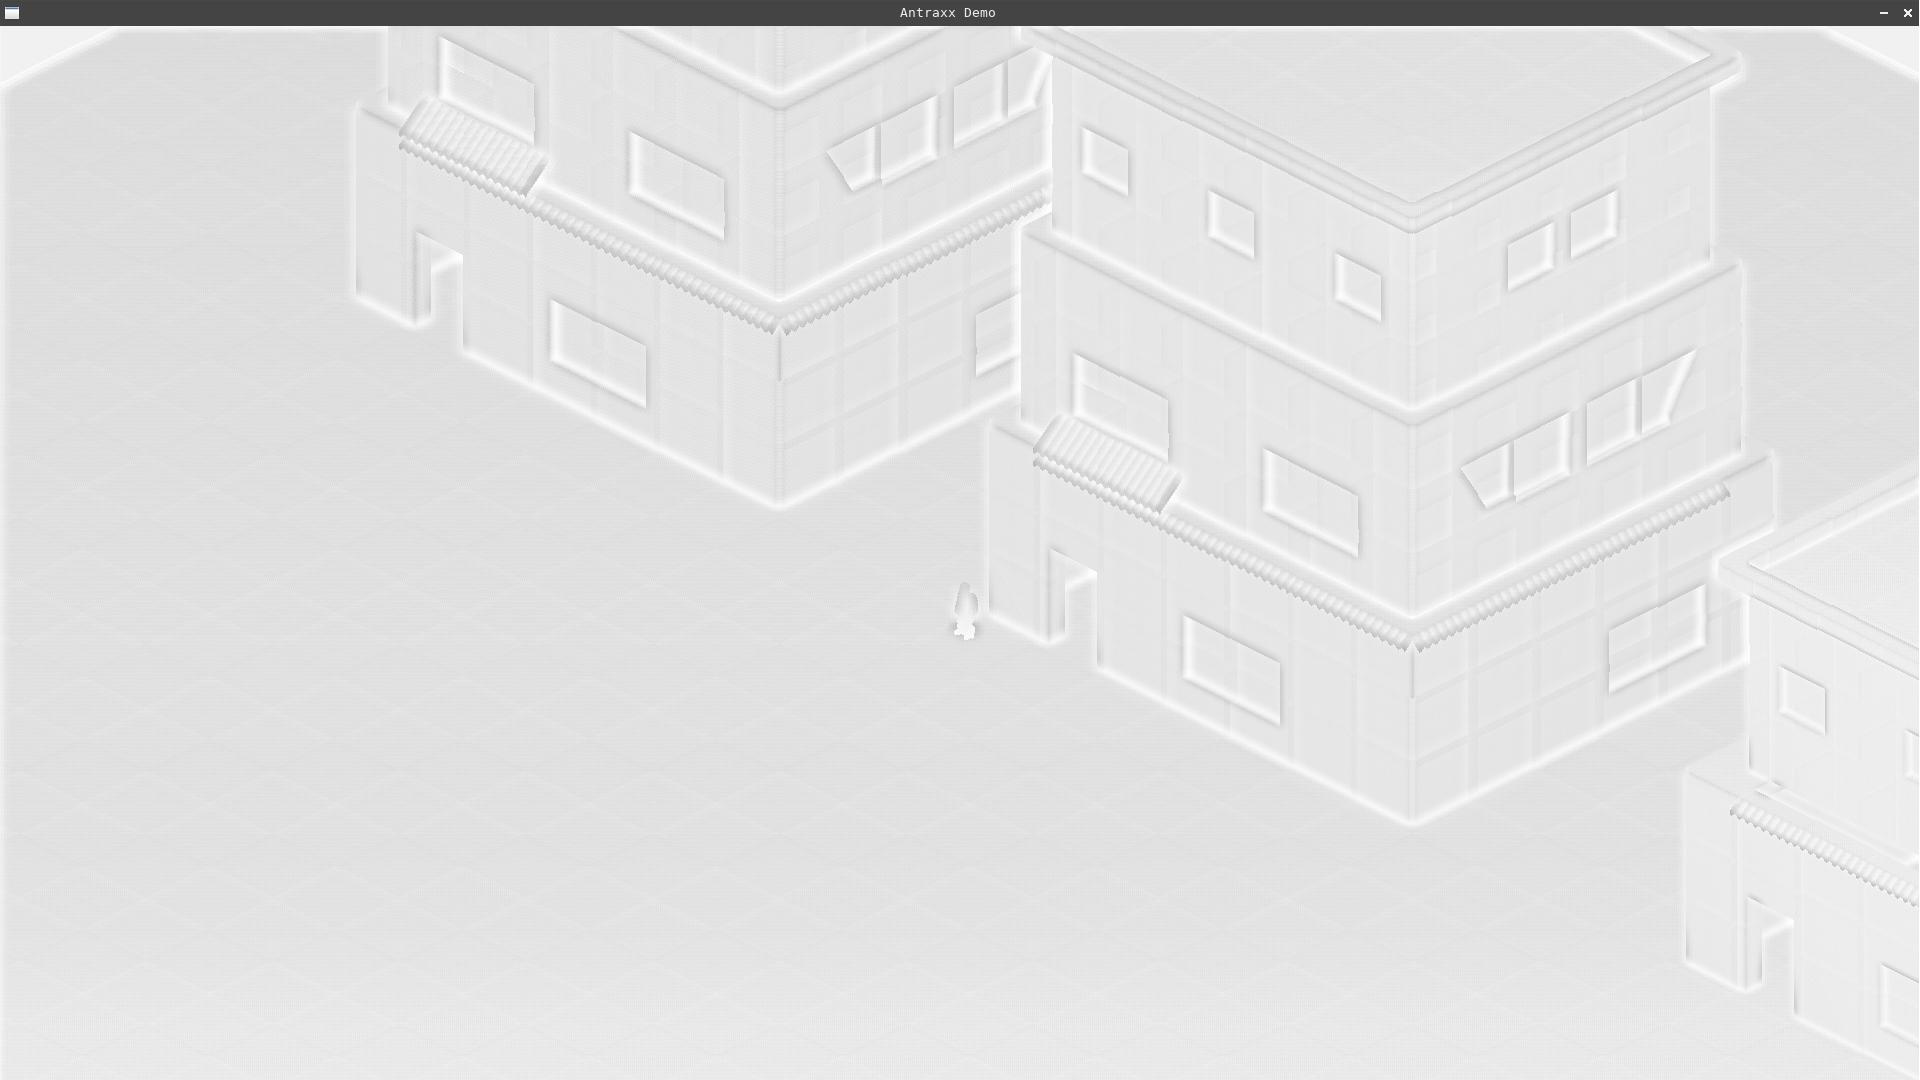 voxels to pixelart 8